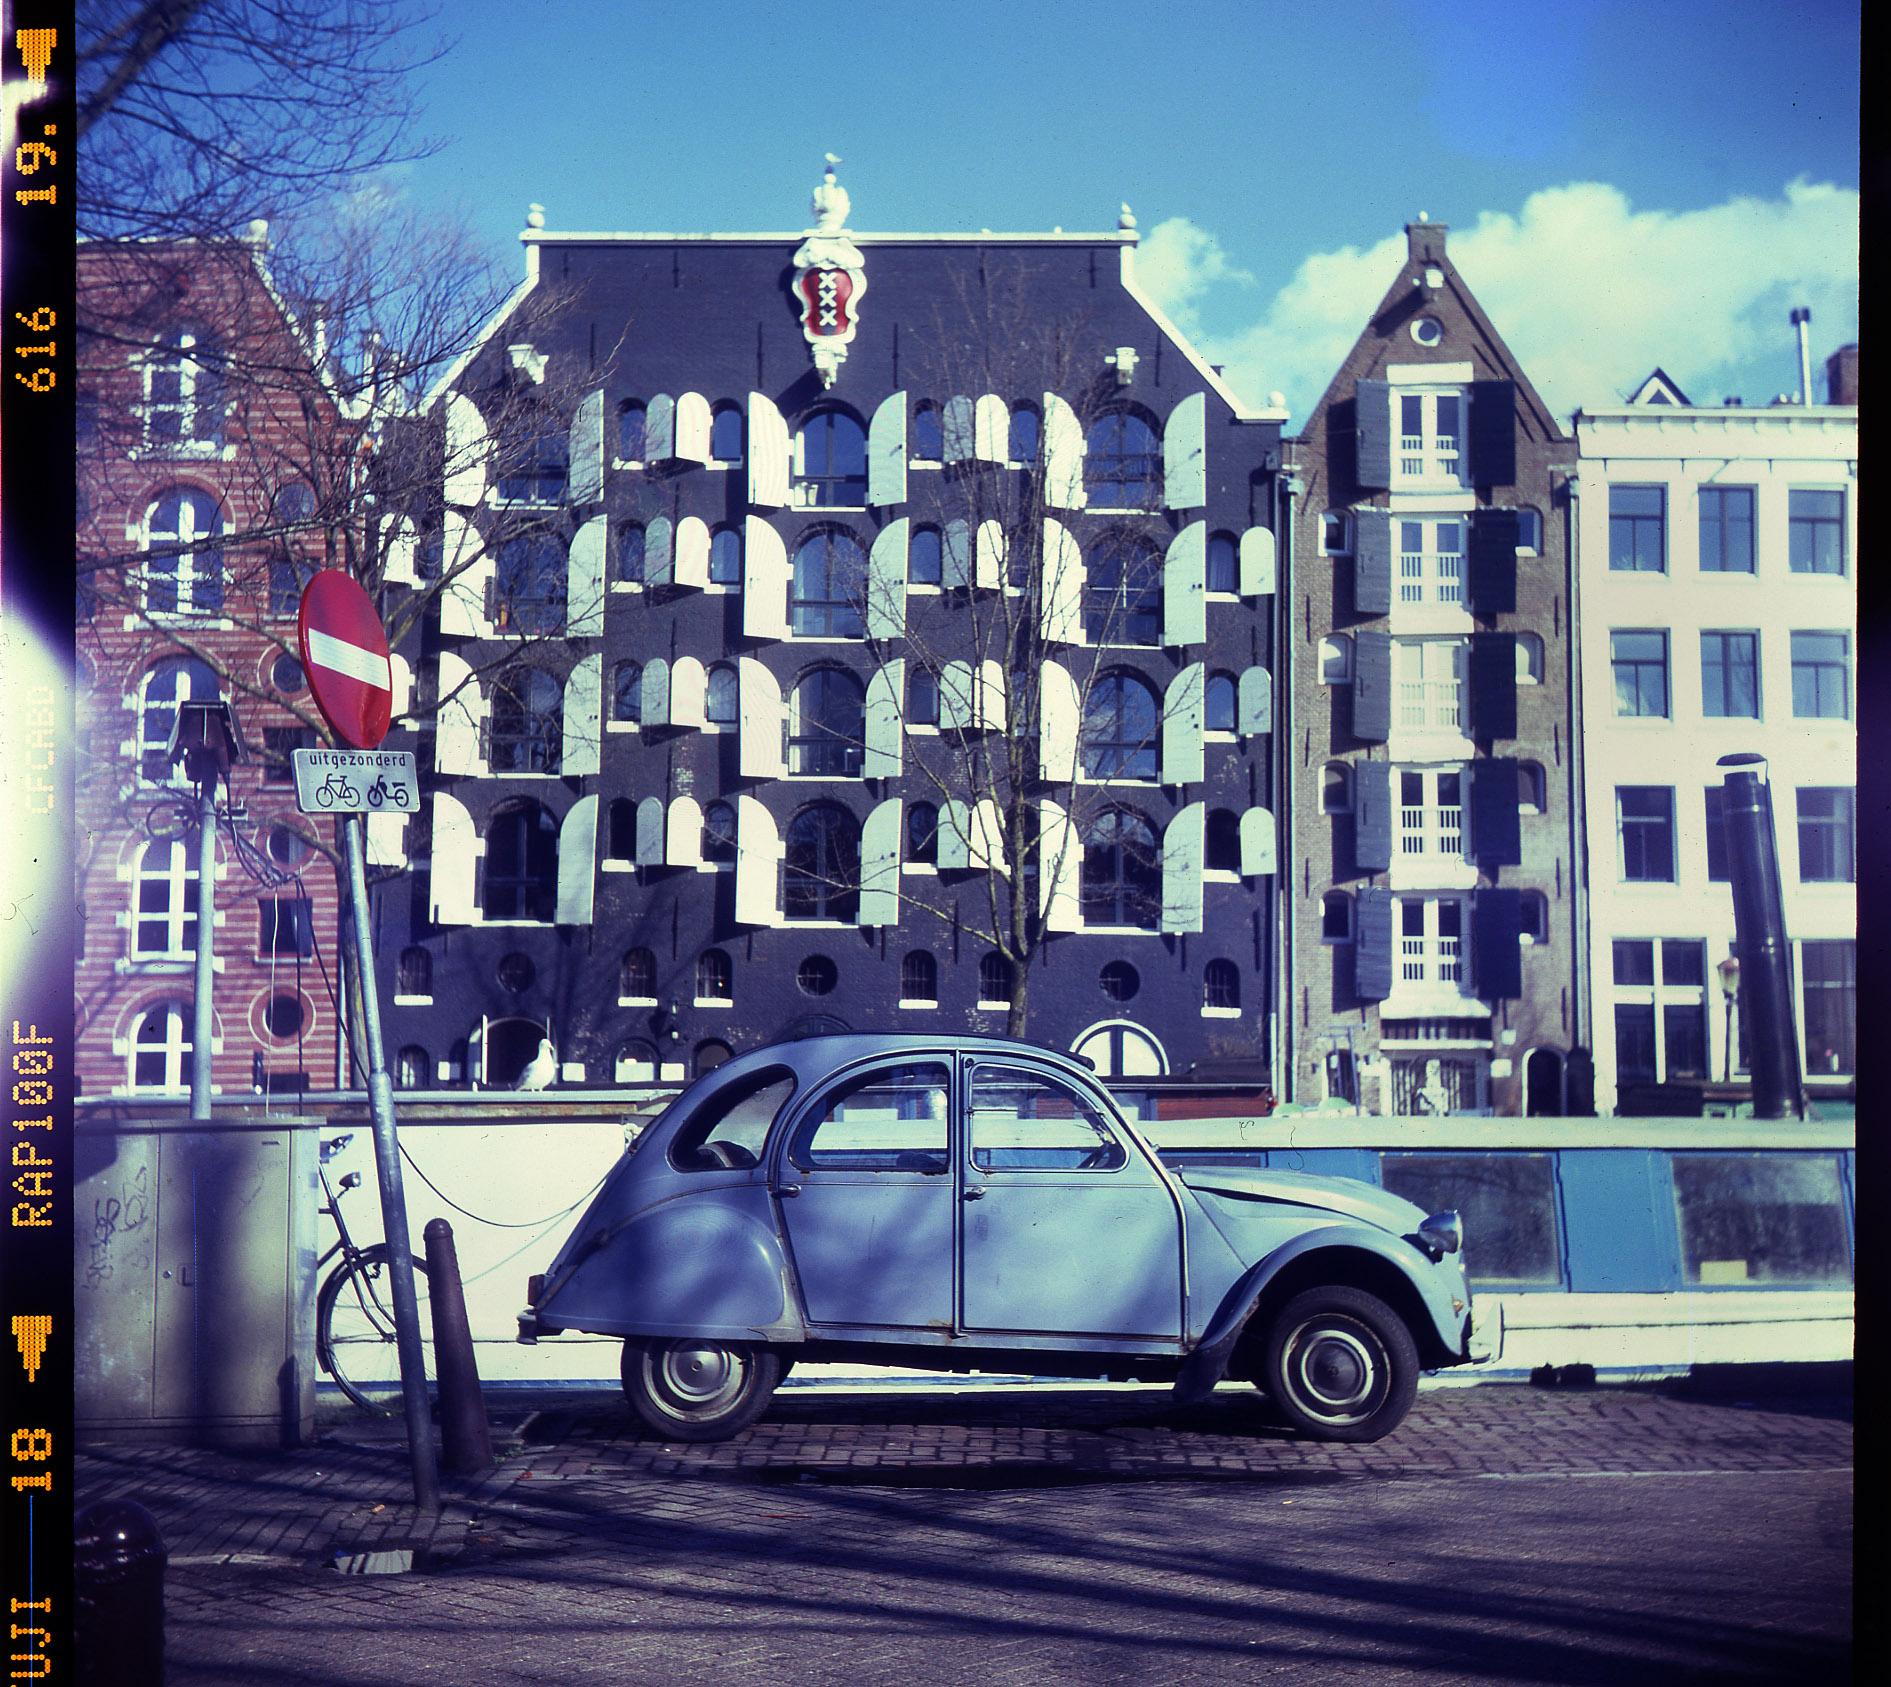 Amsterdam, the Netherlands / 2010